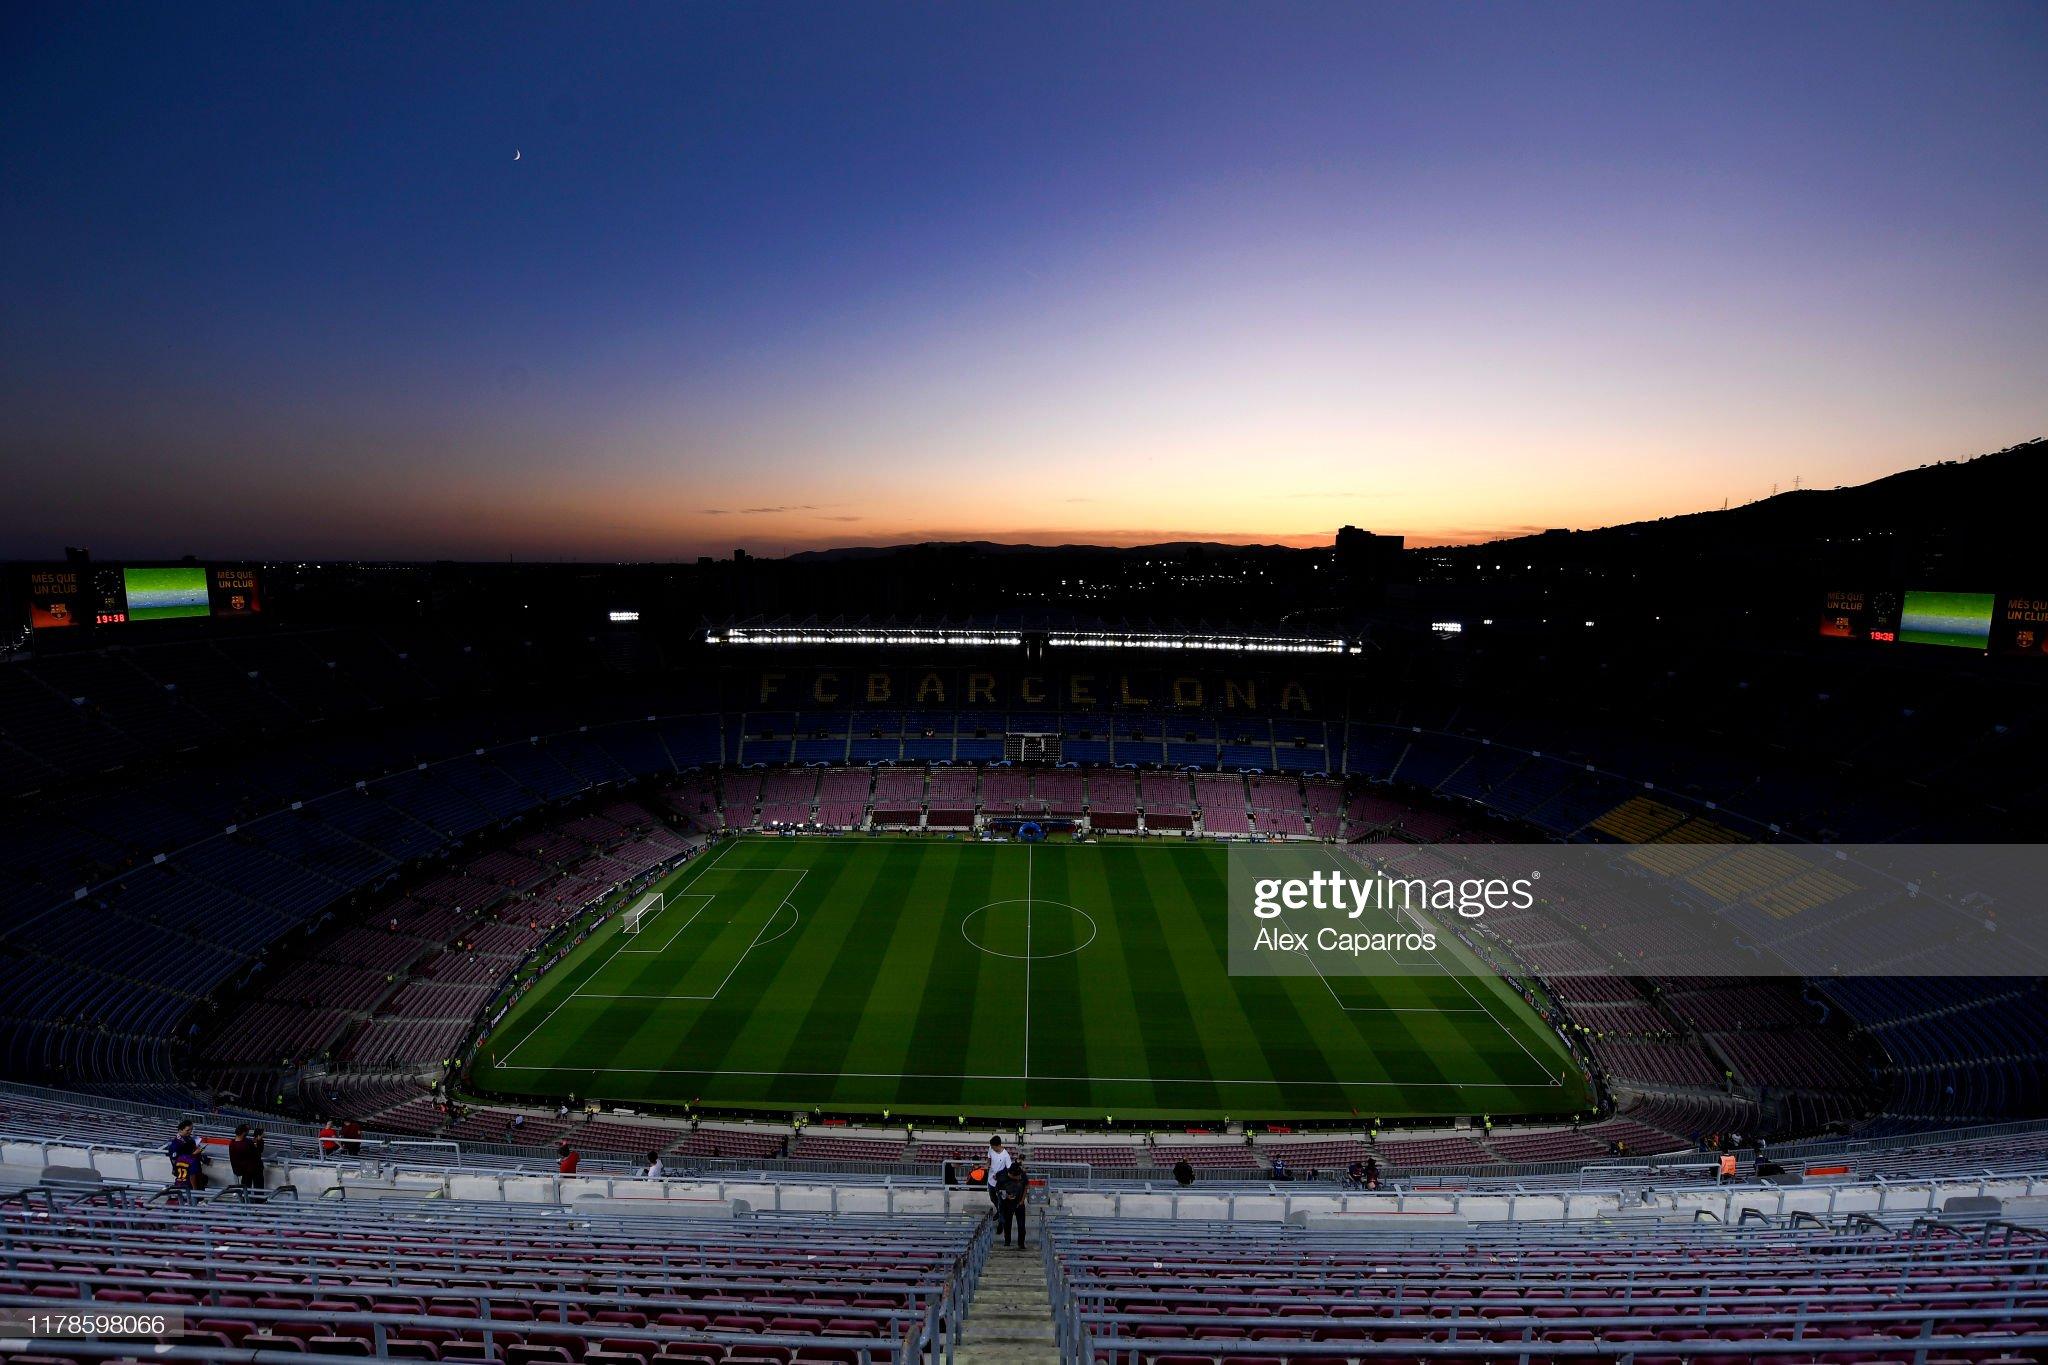 صور مباراة : برشلونة - إنتر 2-1 ( 02-10-2019 )  General-view-inside-the-stadium-prior-to-the-uefa-champions-league-f-picture-id1178598066?s=2048x2048